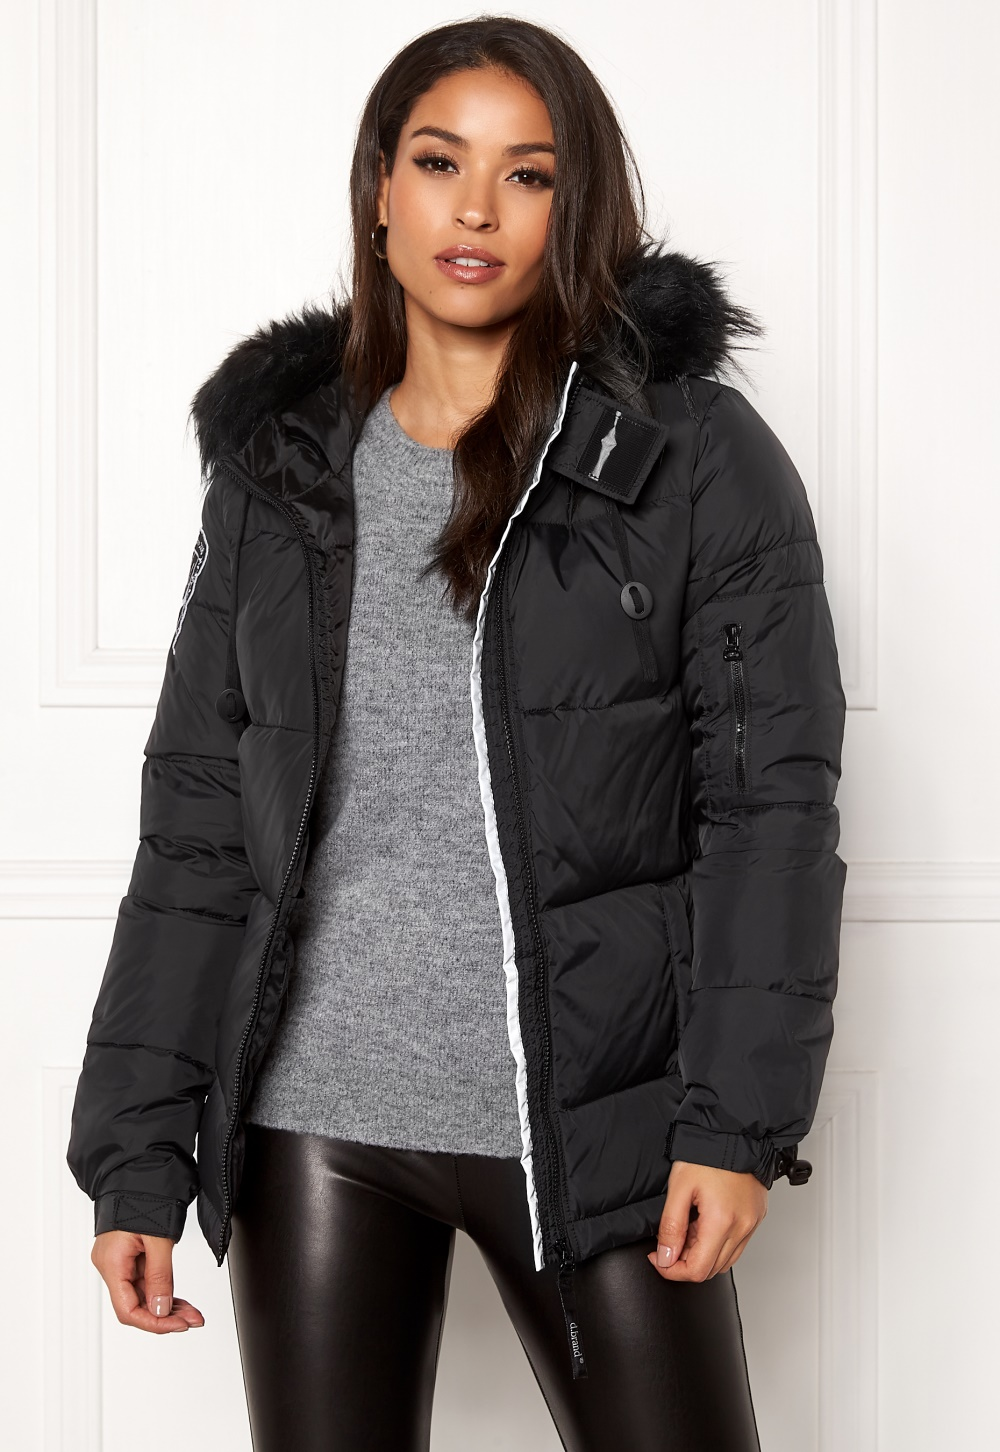 D.Brand Eskimå Short Jacket Black/Black